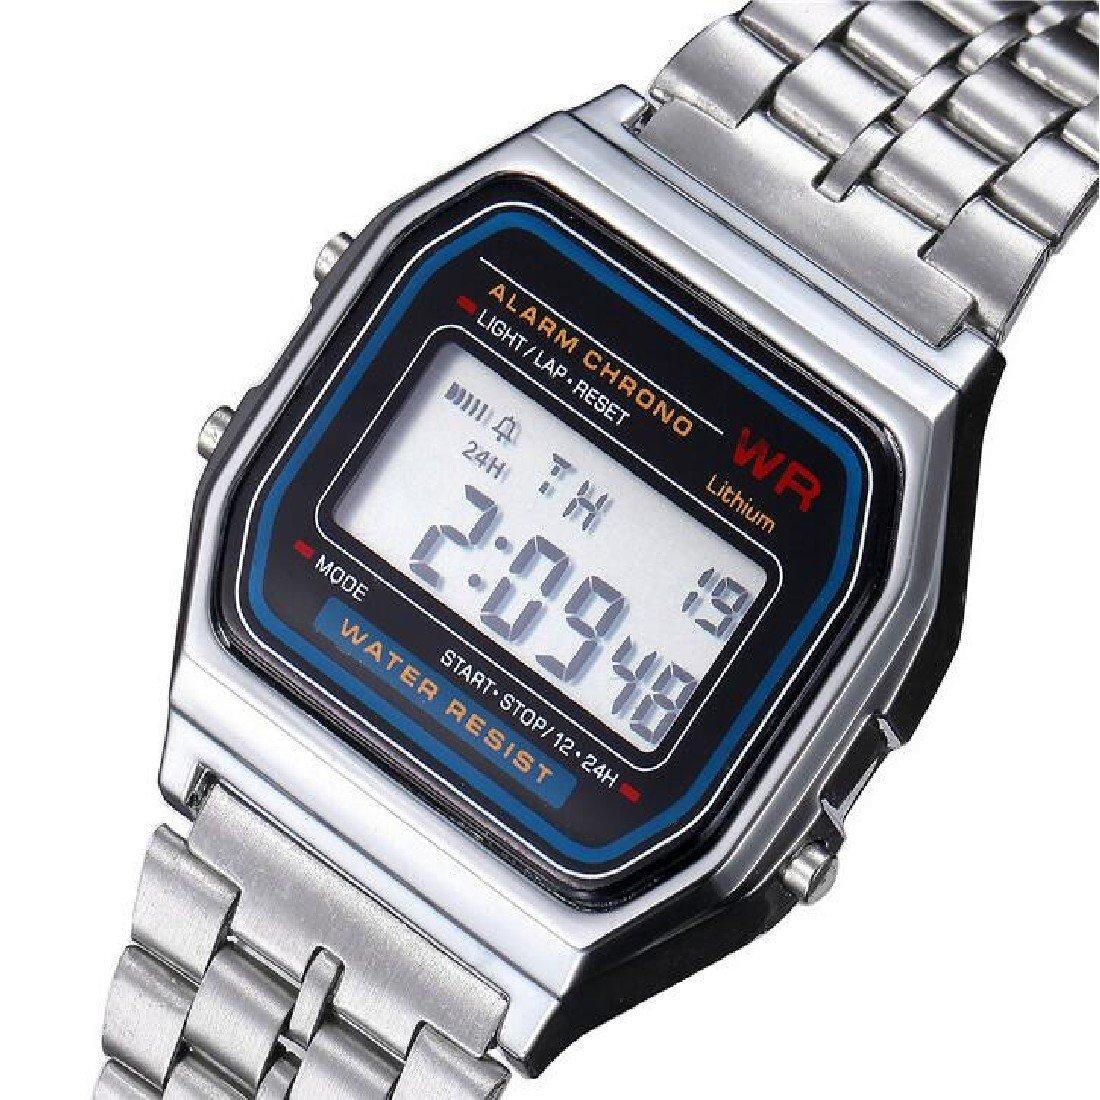 Vintage para Mujer Hombres Square Dial reloj de pulsera LED Digital reloj despertador plata: Amazon.es: Relojes